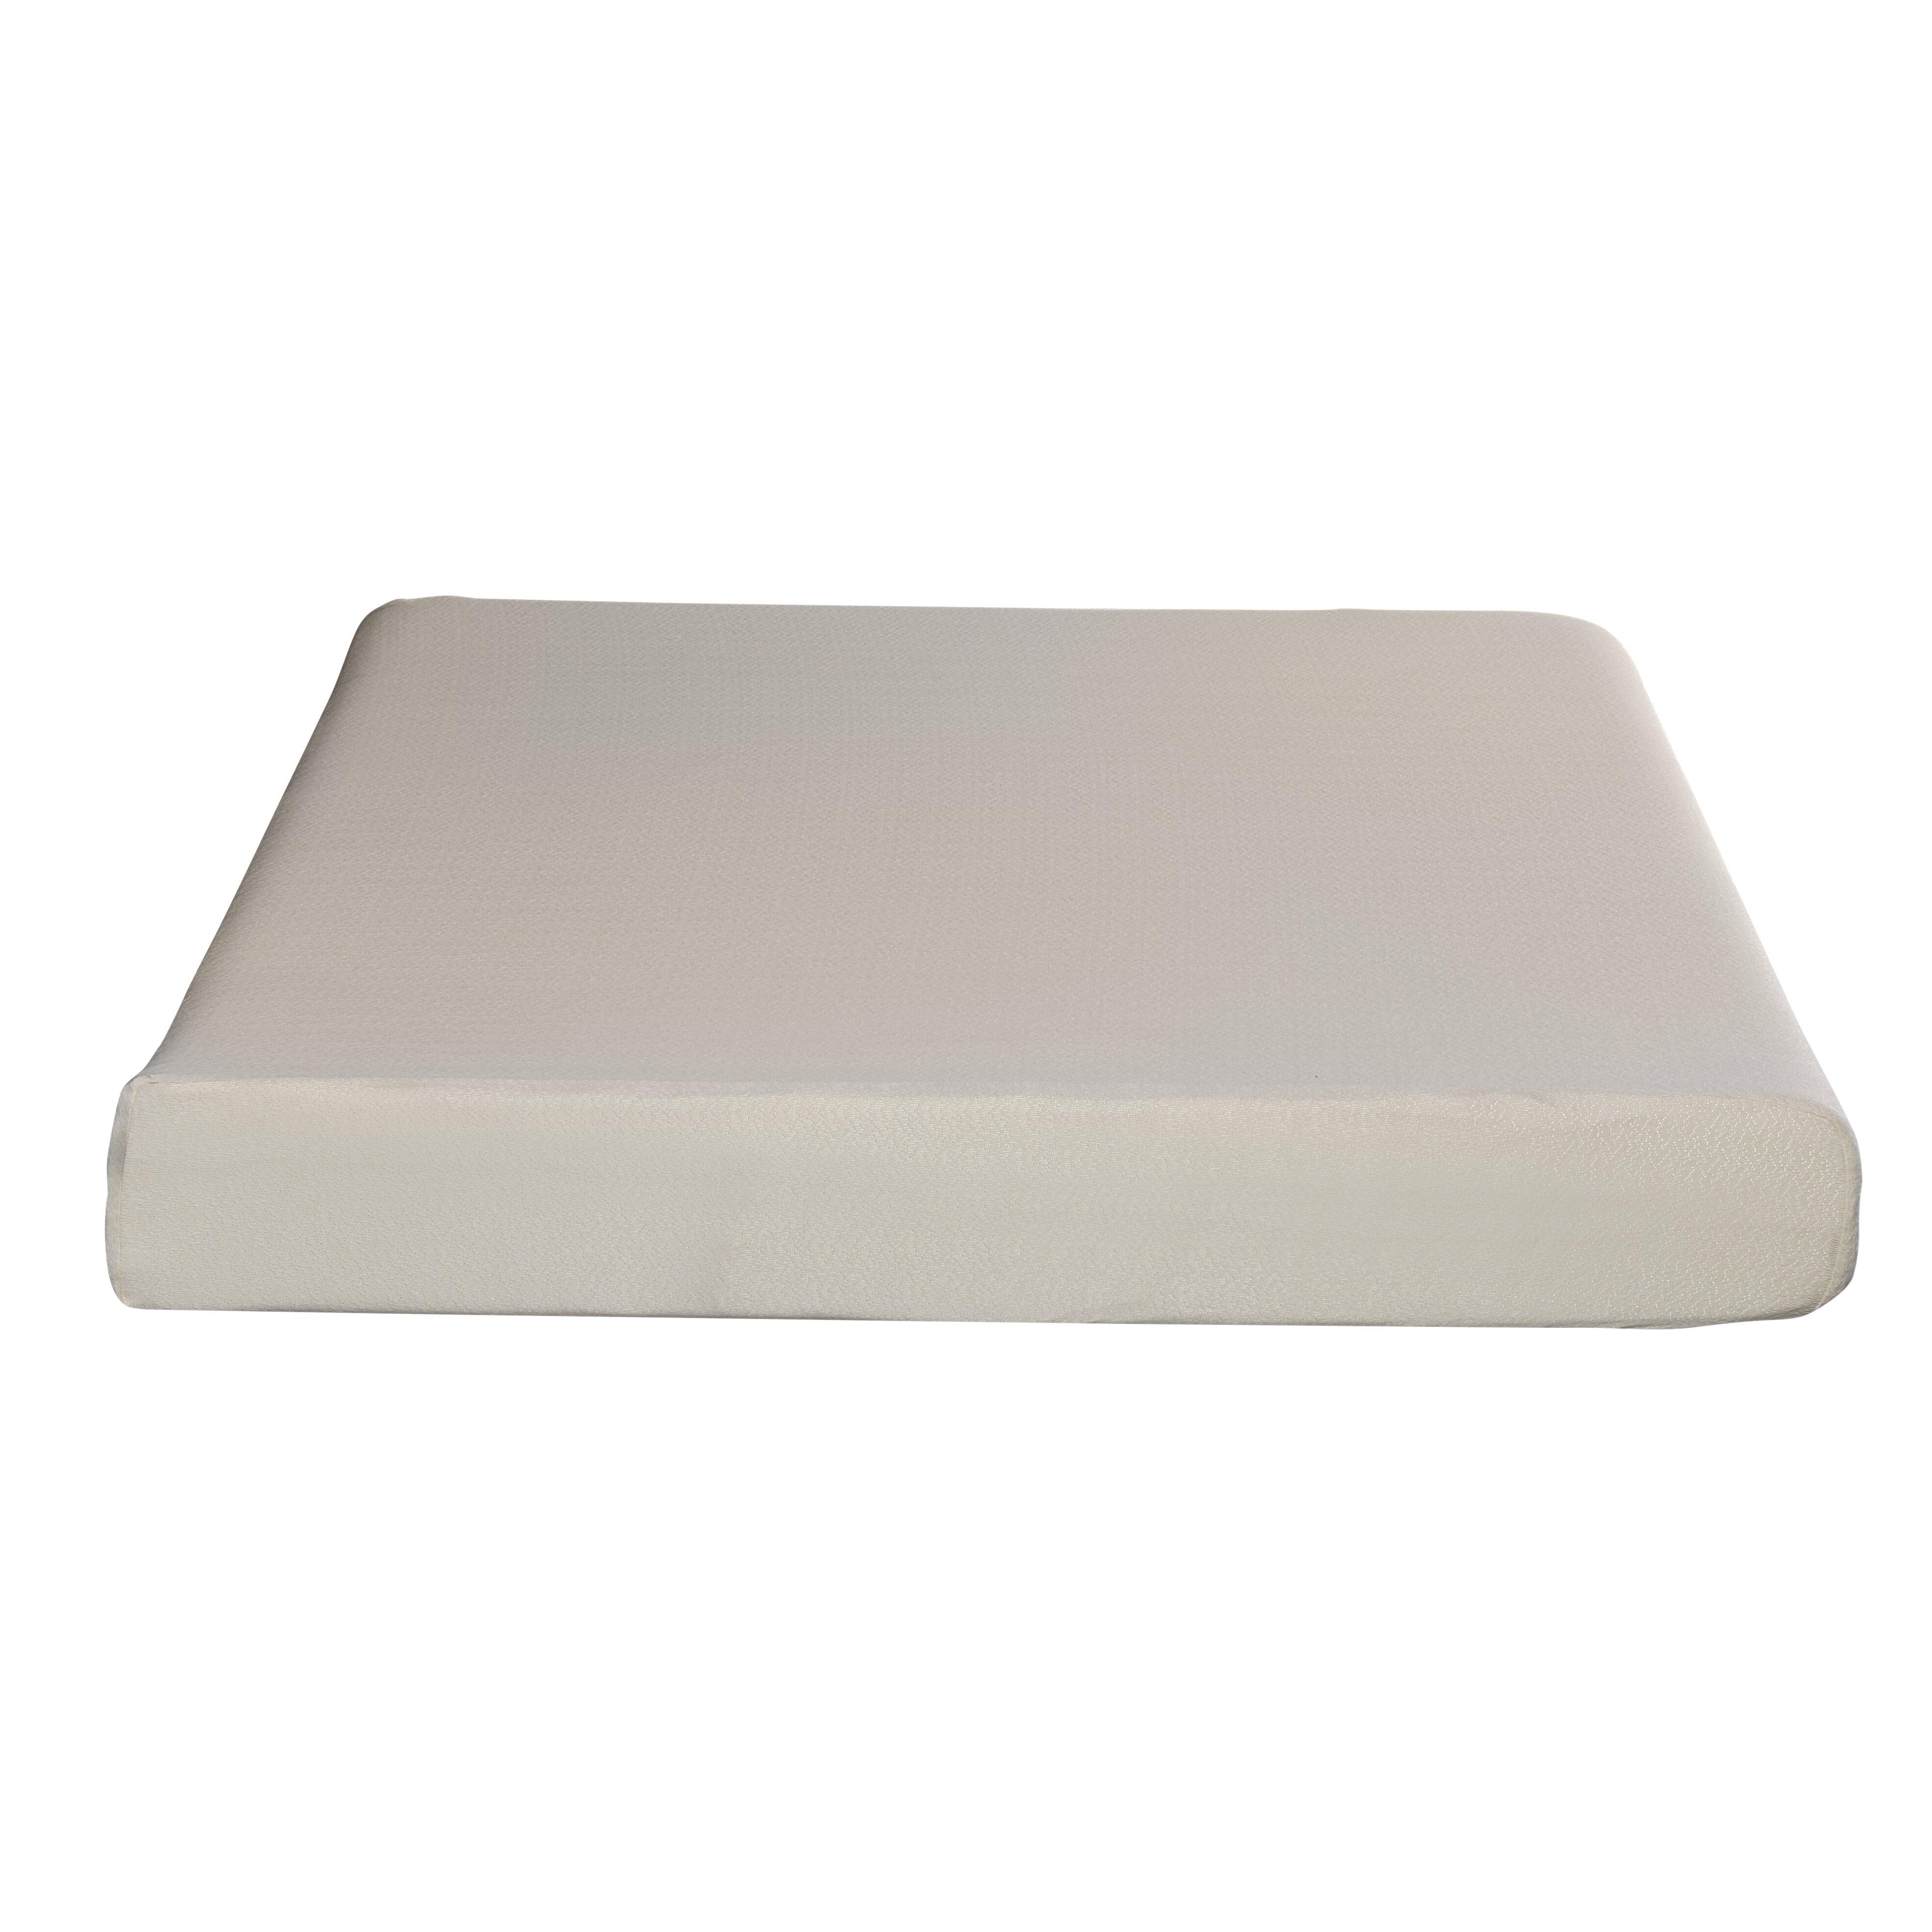 "Signature Sleep Memoir 8"" Full Size Memory Foam Mattress"